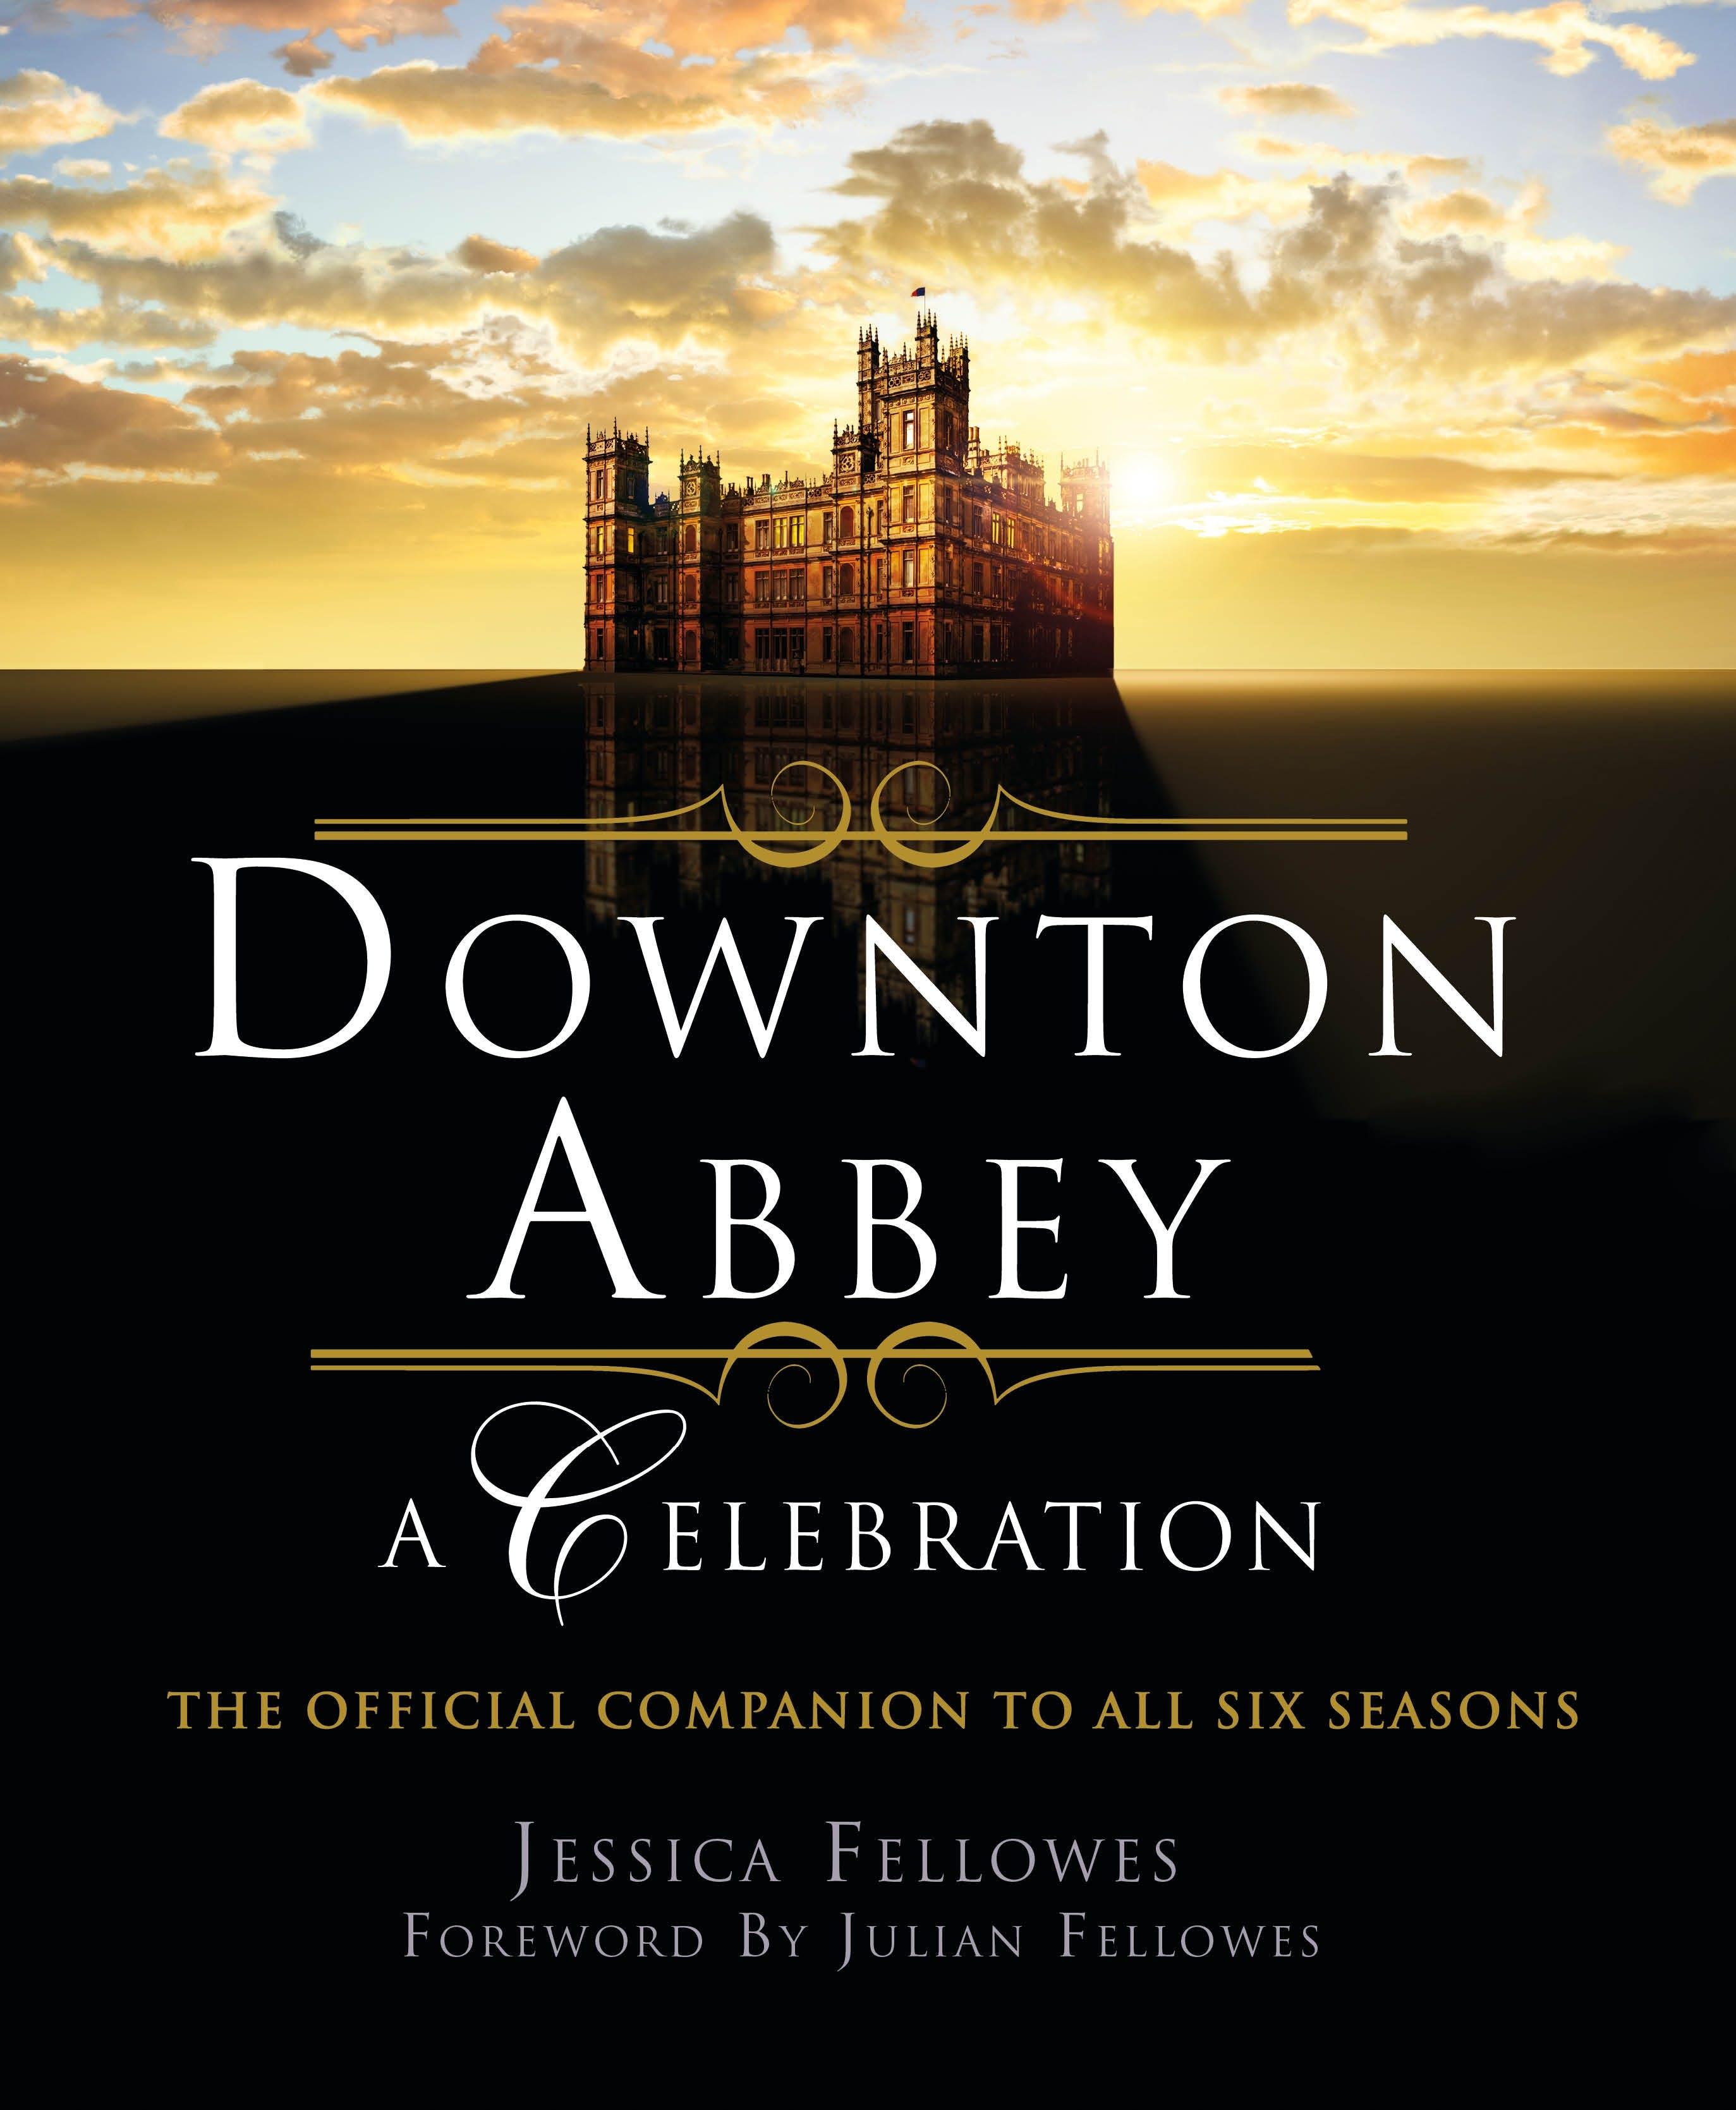 Image of Downton Abbey - A Celebration